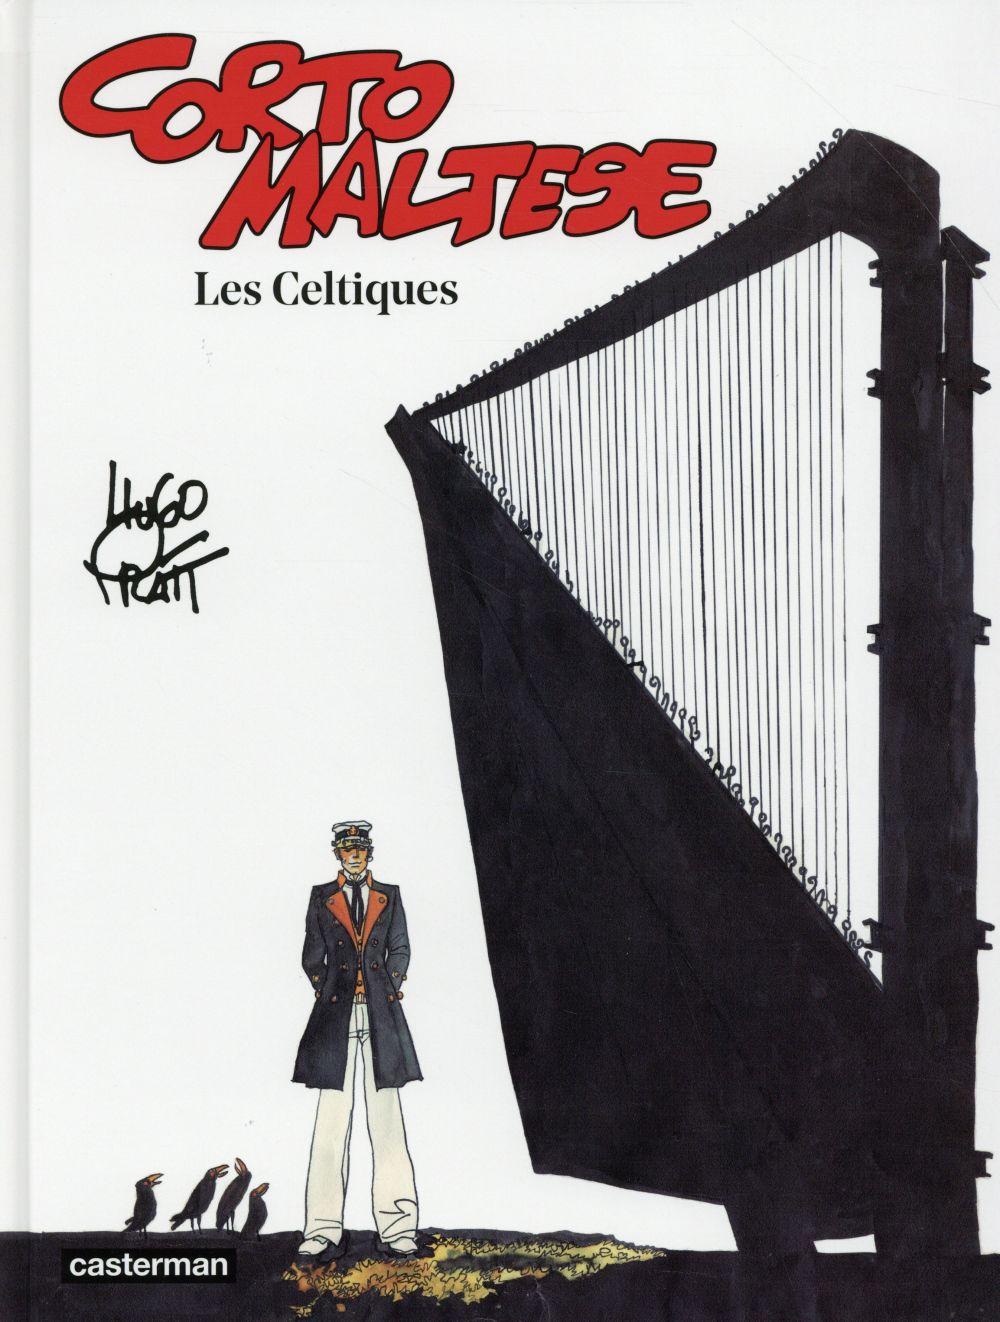 CORTO MALTESE T.4  -  LES CELTIQUES PRATT Casterman